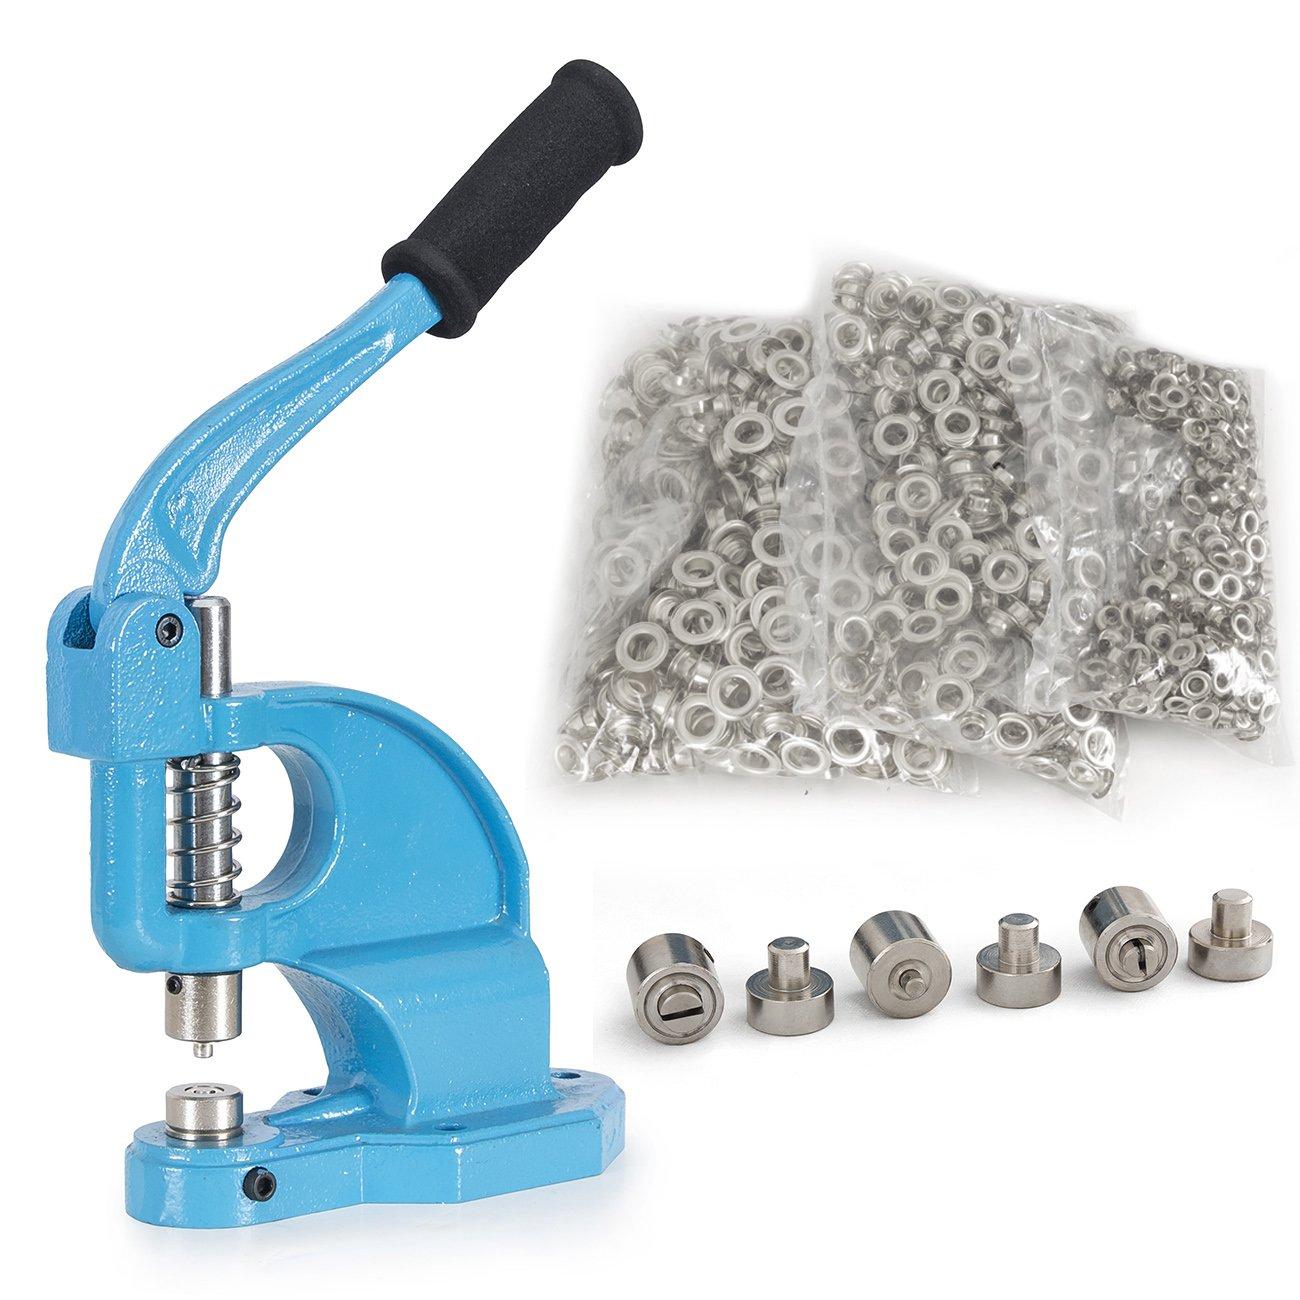 ARKSEN Eyelet Maker Hand Press Grommet Machine w/ 1500PC Set Grommets 3 Die #0 #2 #4, Blue